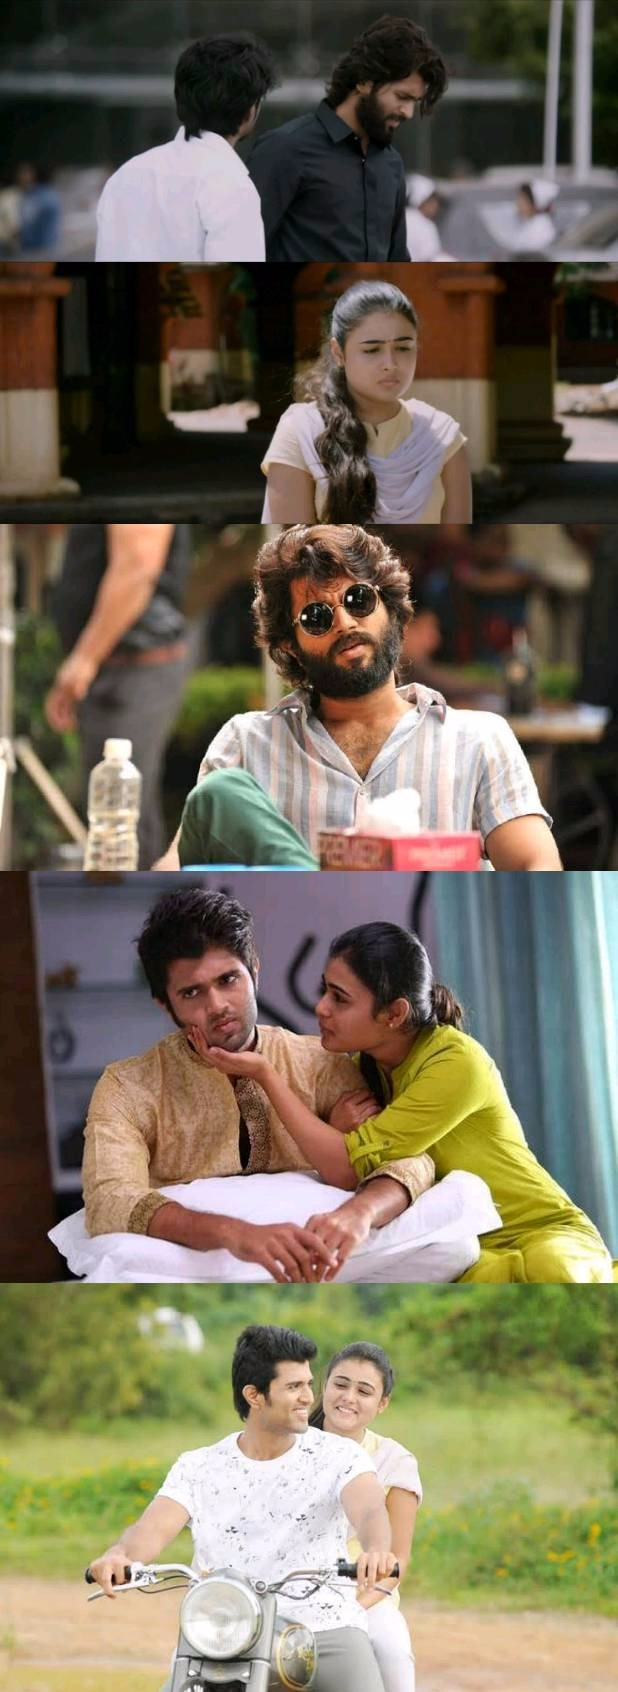 Arjun Reddy 2017 Telugu HDrip 480p 500MB 720p 950MB Hindi Subs